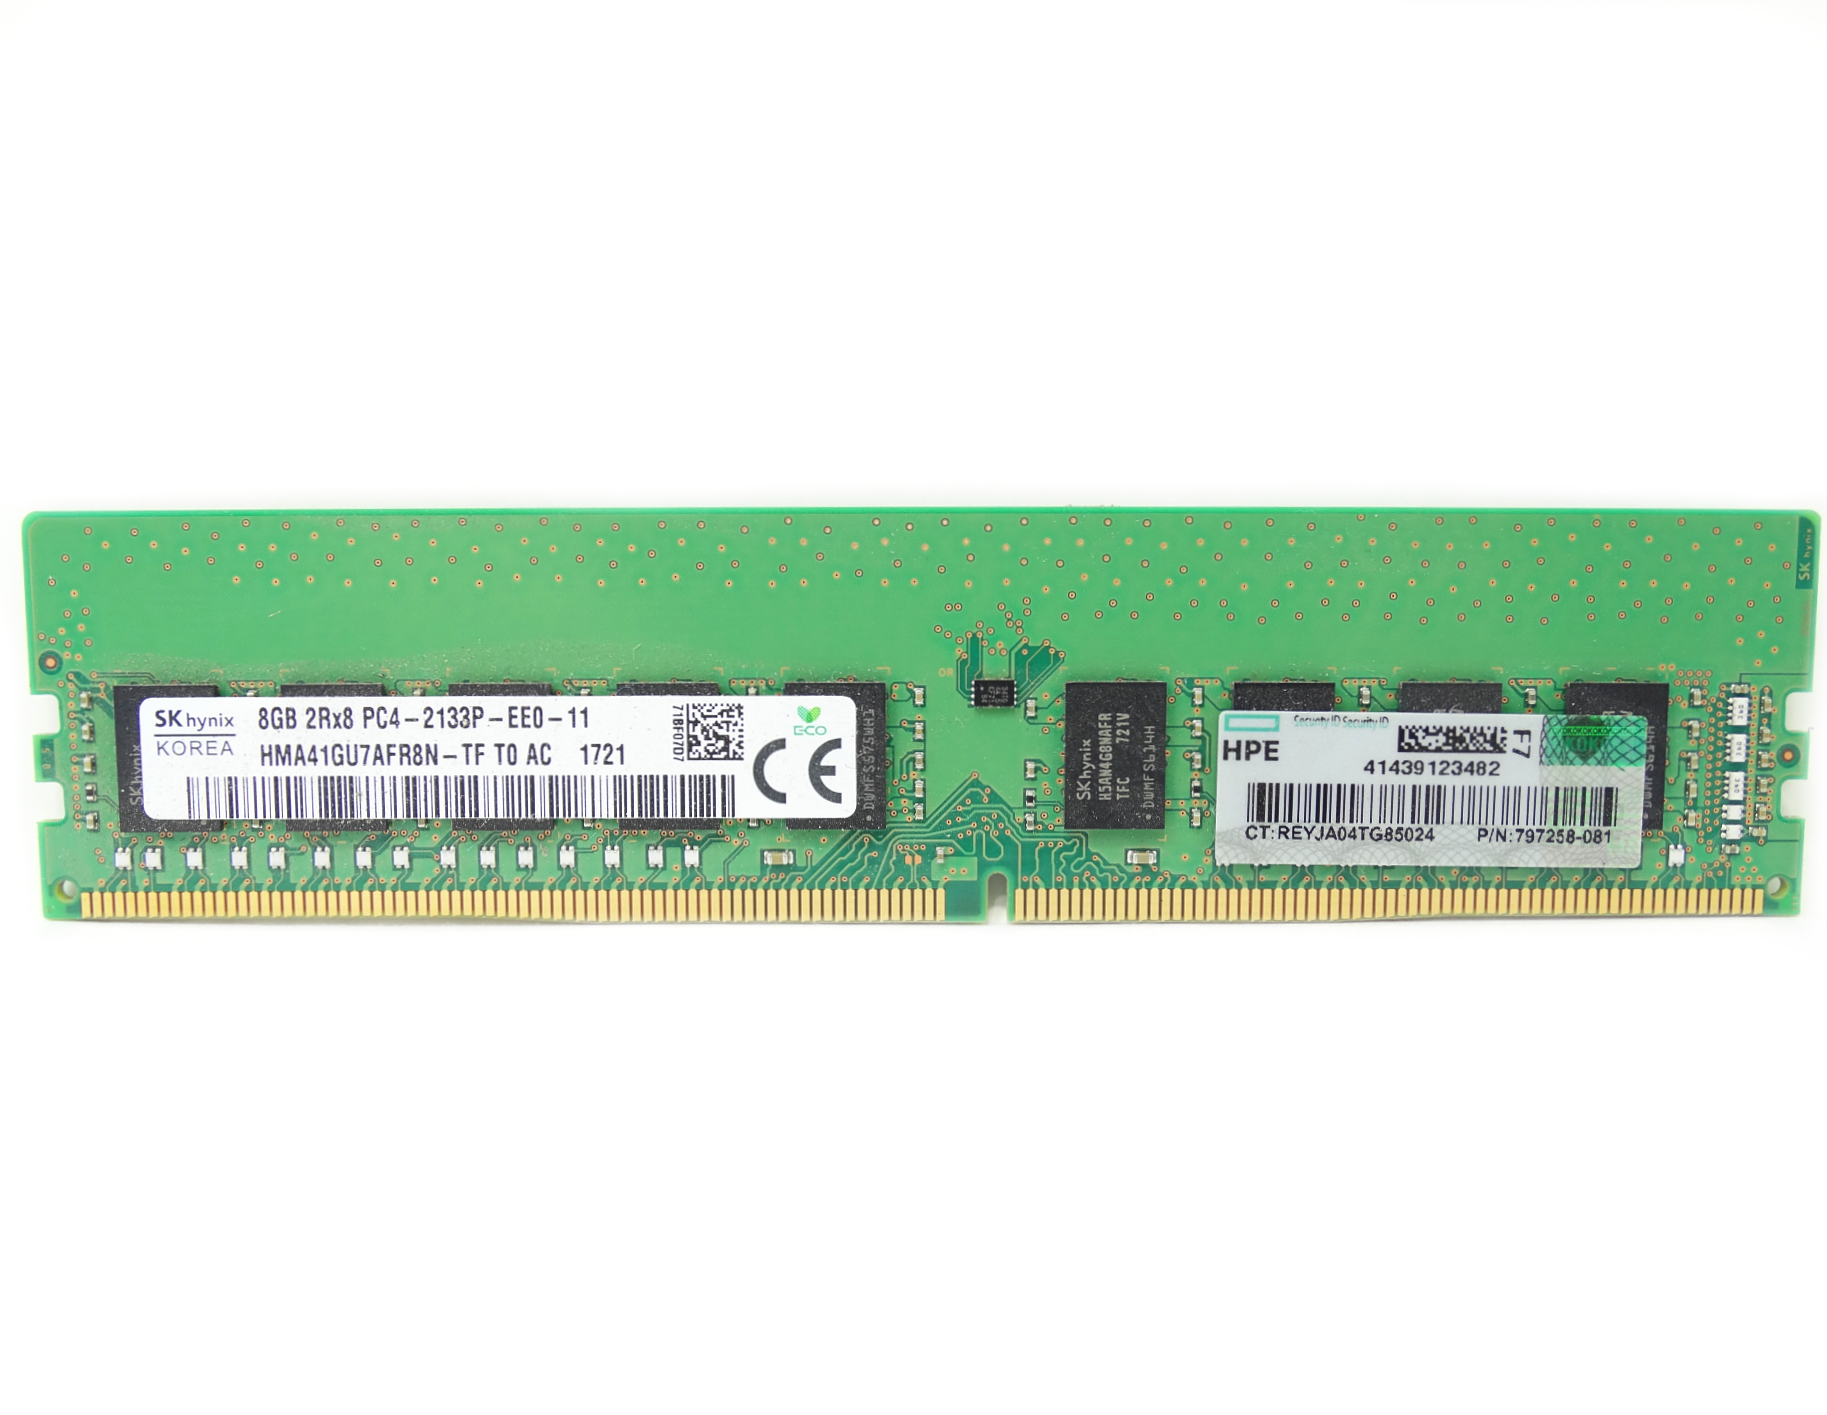 HP 8GB 2Rx8 PC4-17000 DDR4-2133MHz ECC Unbuffered DIMM RAM Memory (797258-081)